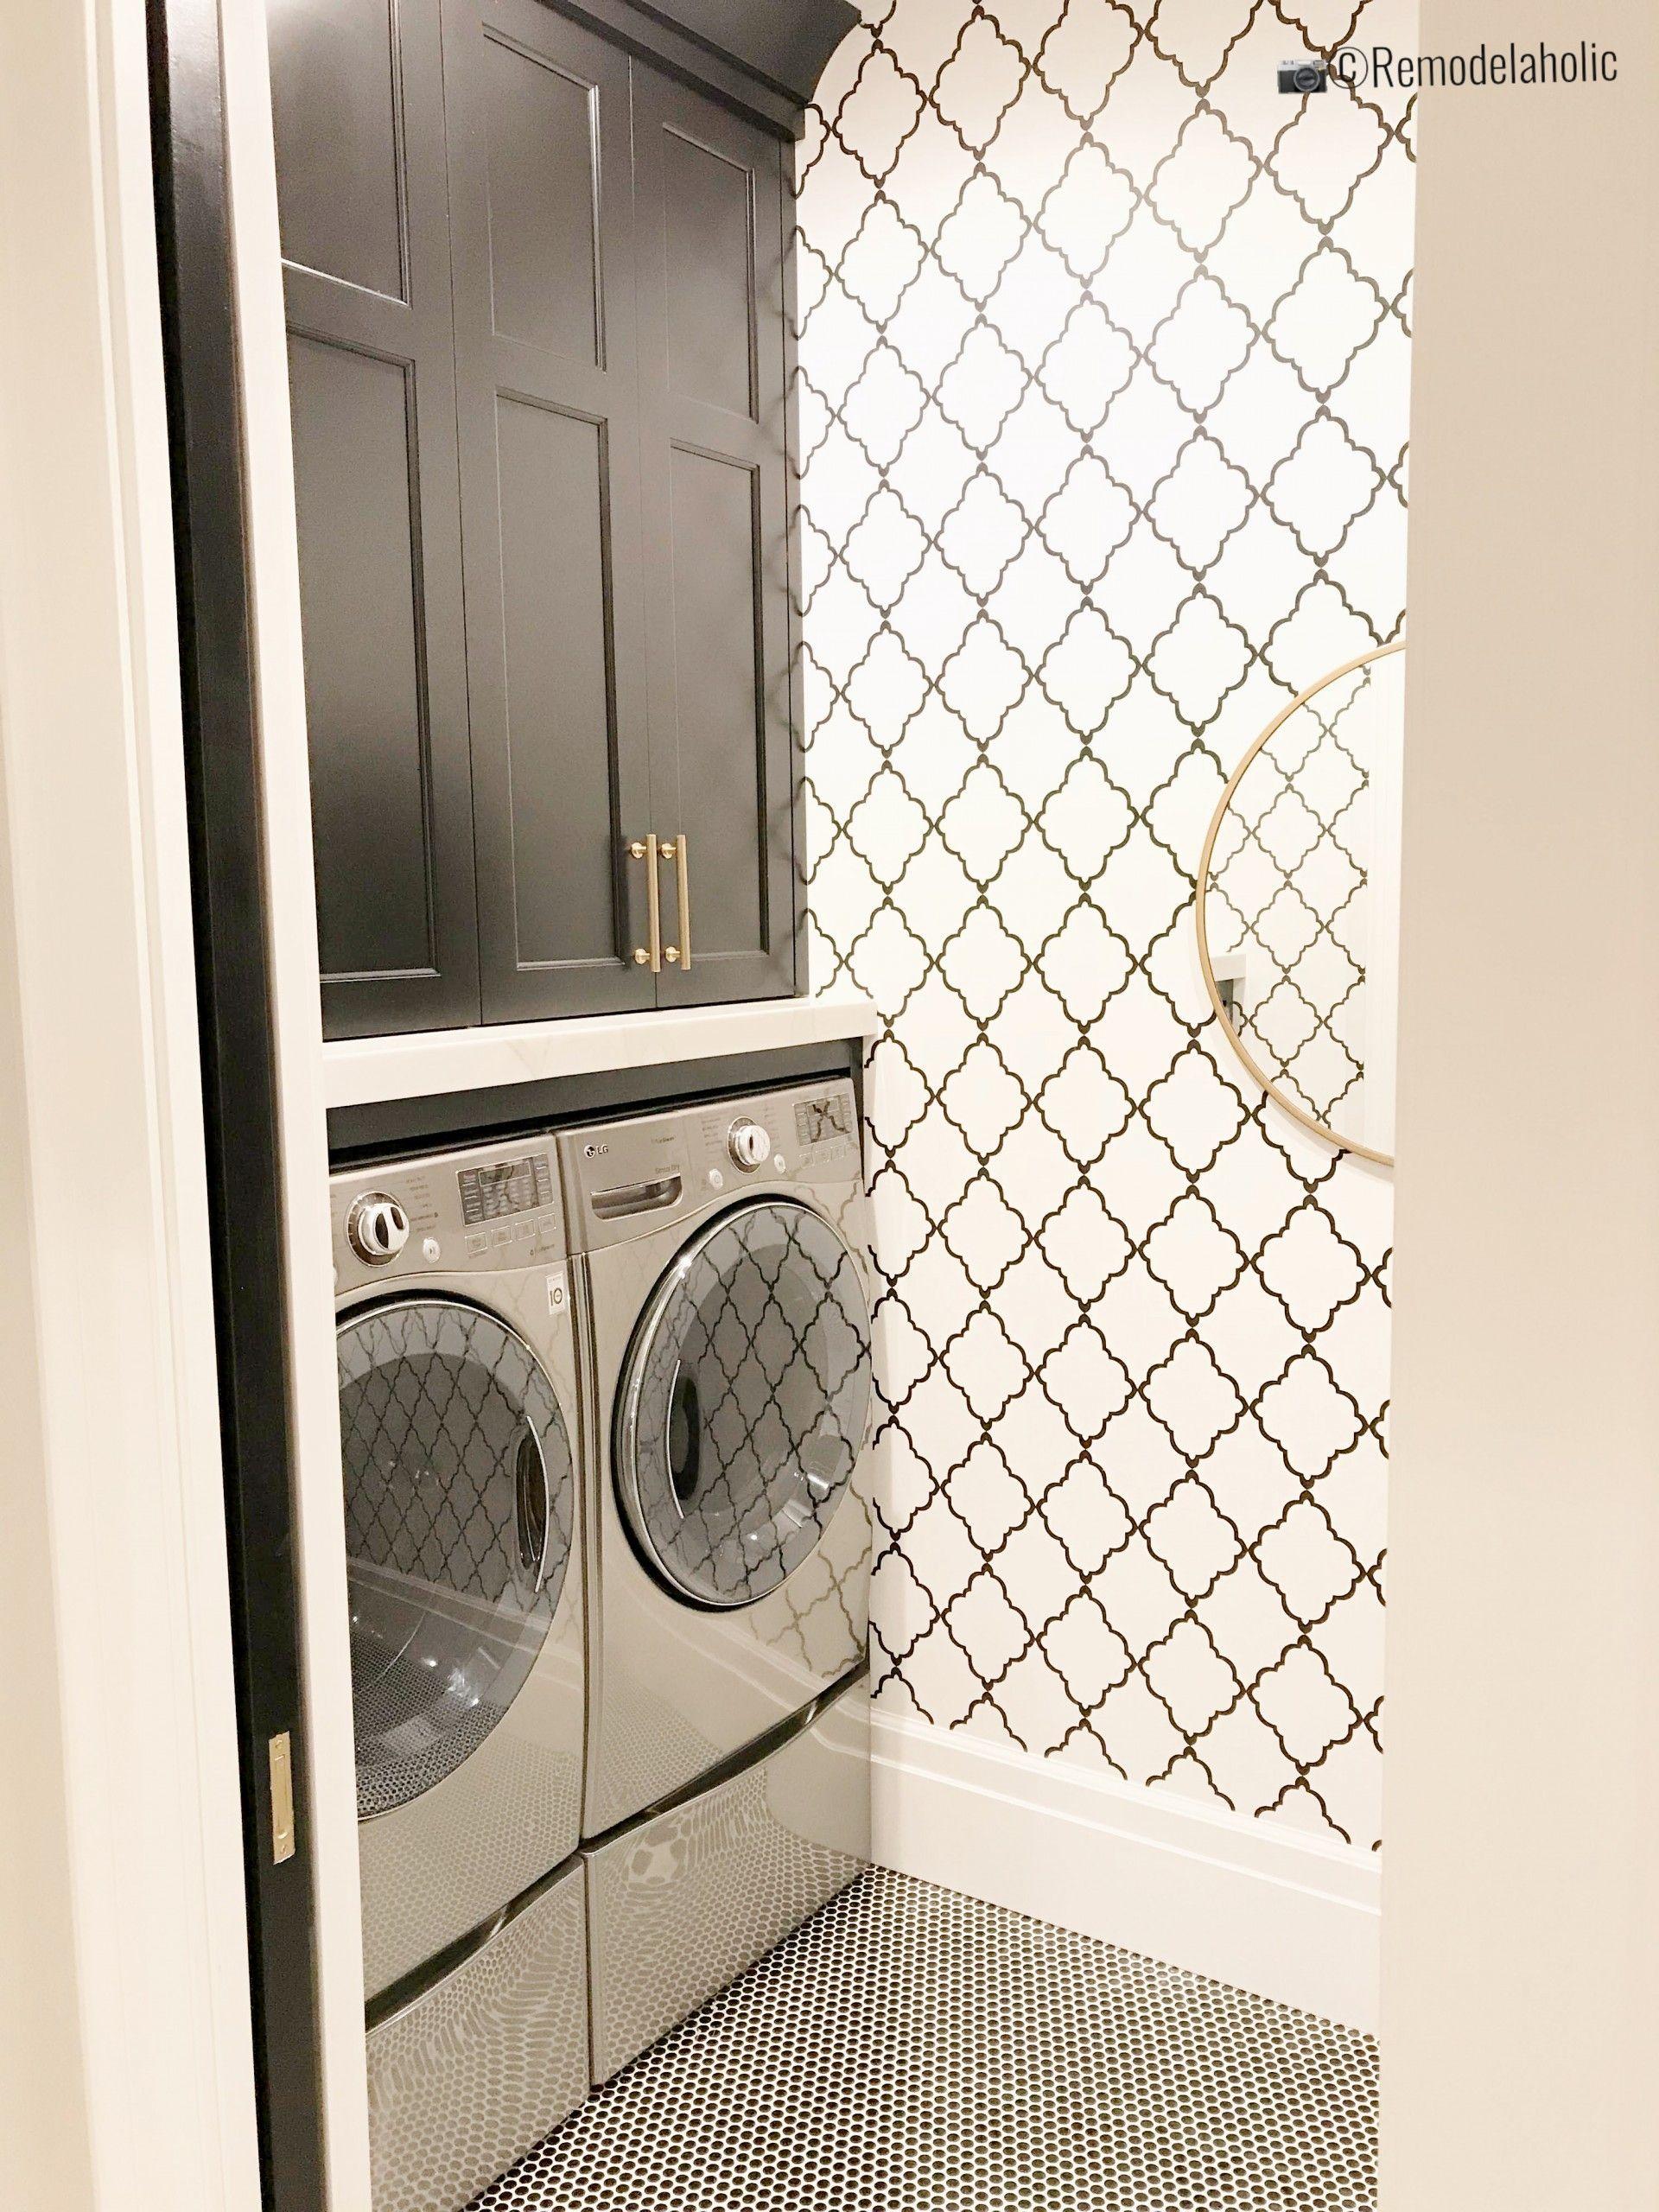 Kitchen And Bathroom Splashback Removable Vinyl Wallpaper Etsy Laundry Room Inspiration Bathroom Splashback Laundry Room Design